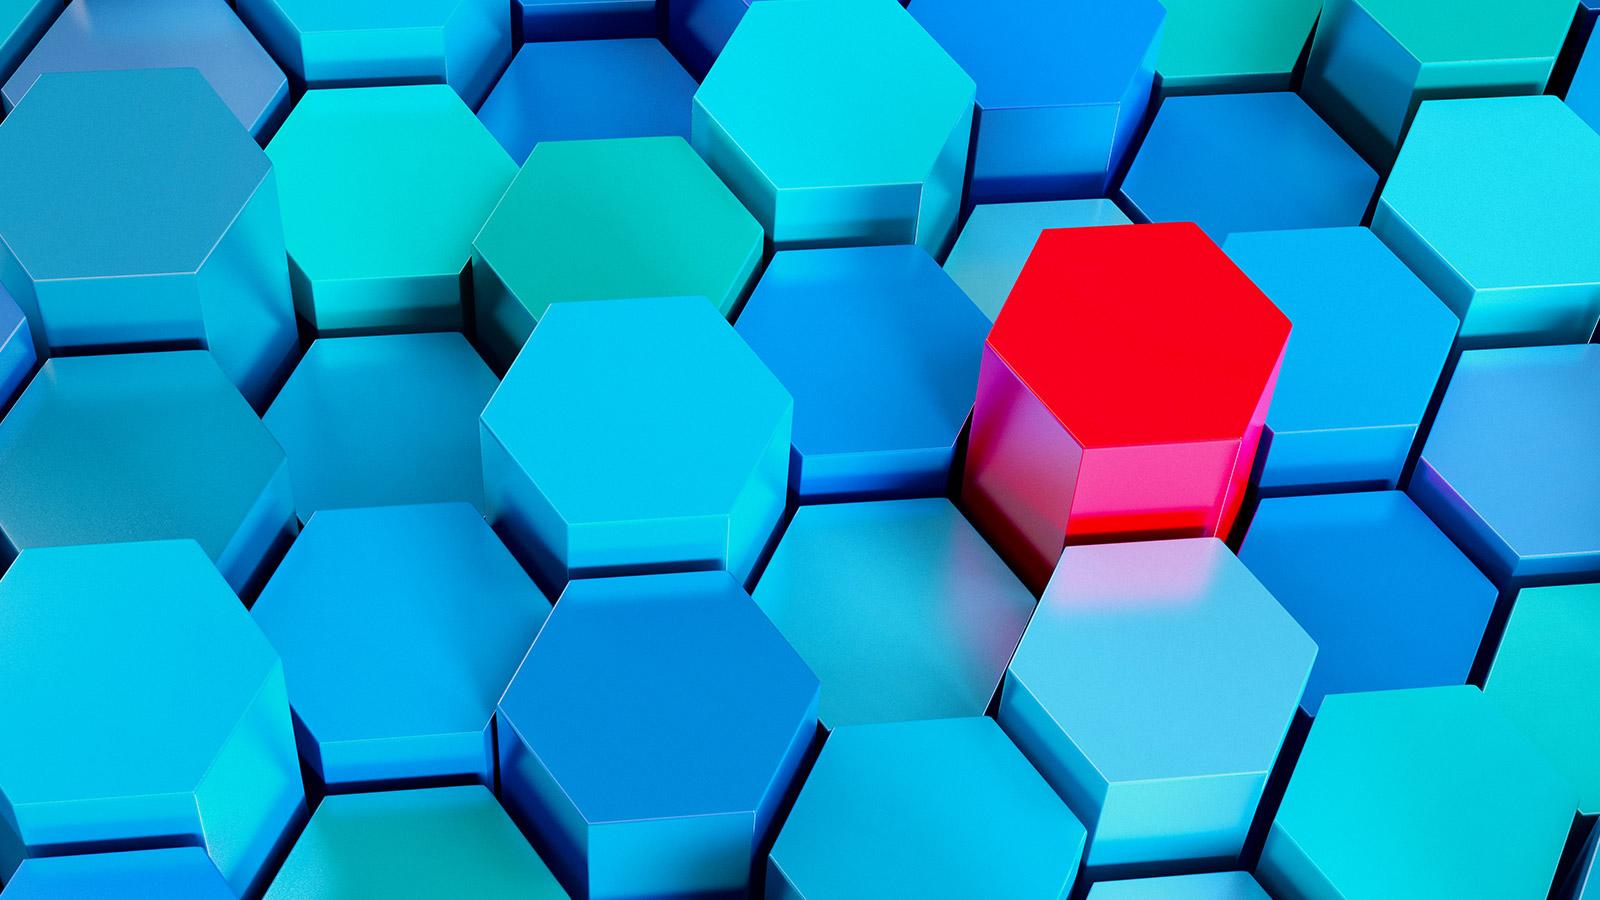 https://www.accenture.com/t20161210T005122w1920/gr-en/_acnmedia/Accenture/Conversion-Assets/DotCom/Images/Global-2/Technology/Accenture-AI-Latest-Economic-Superpower.jpg